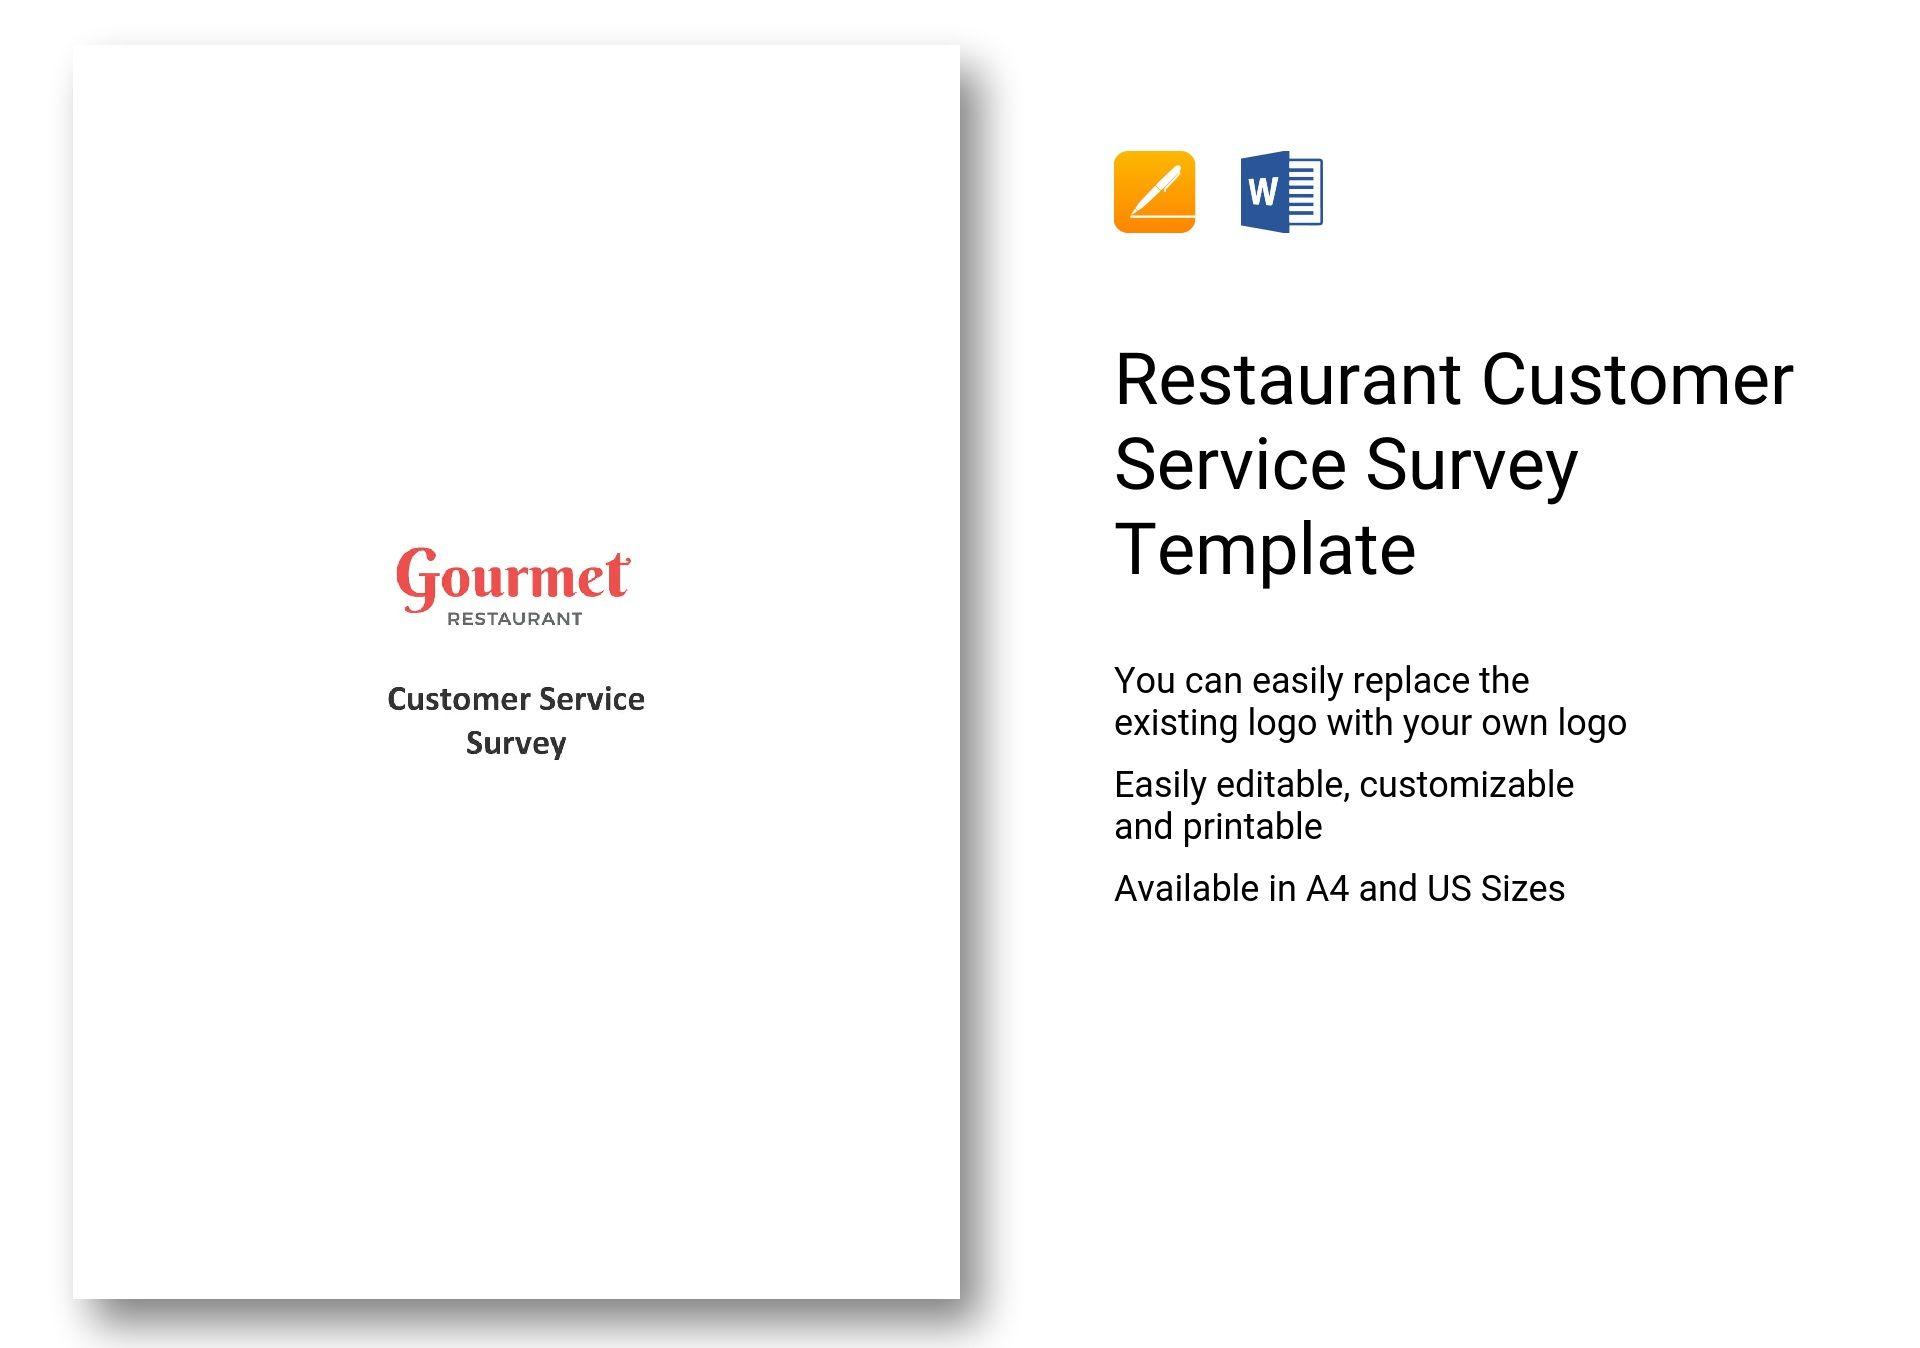 Restaurant Customer Service Survey